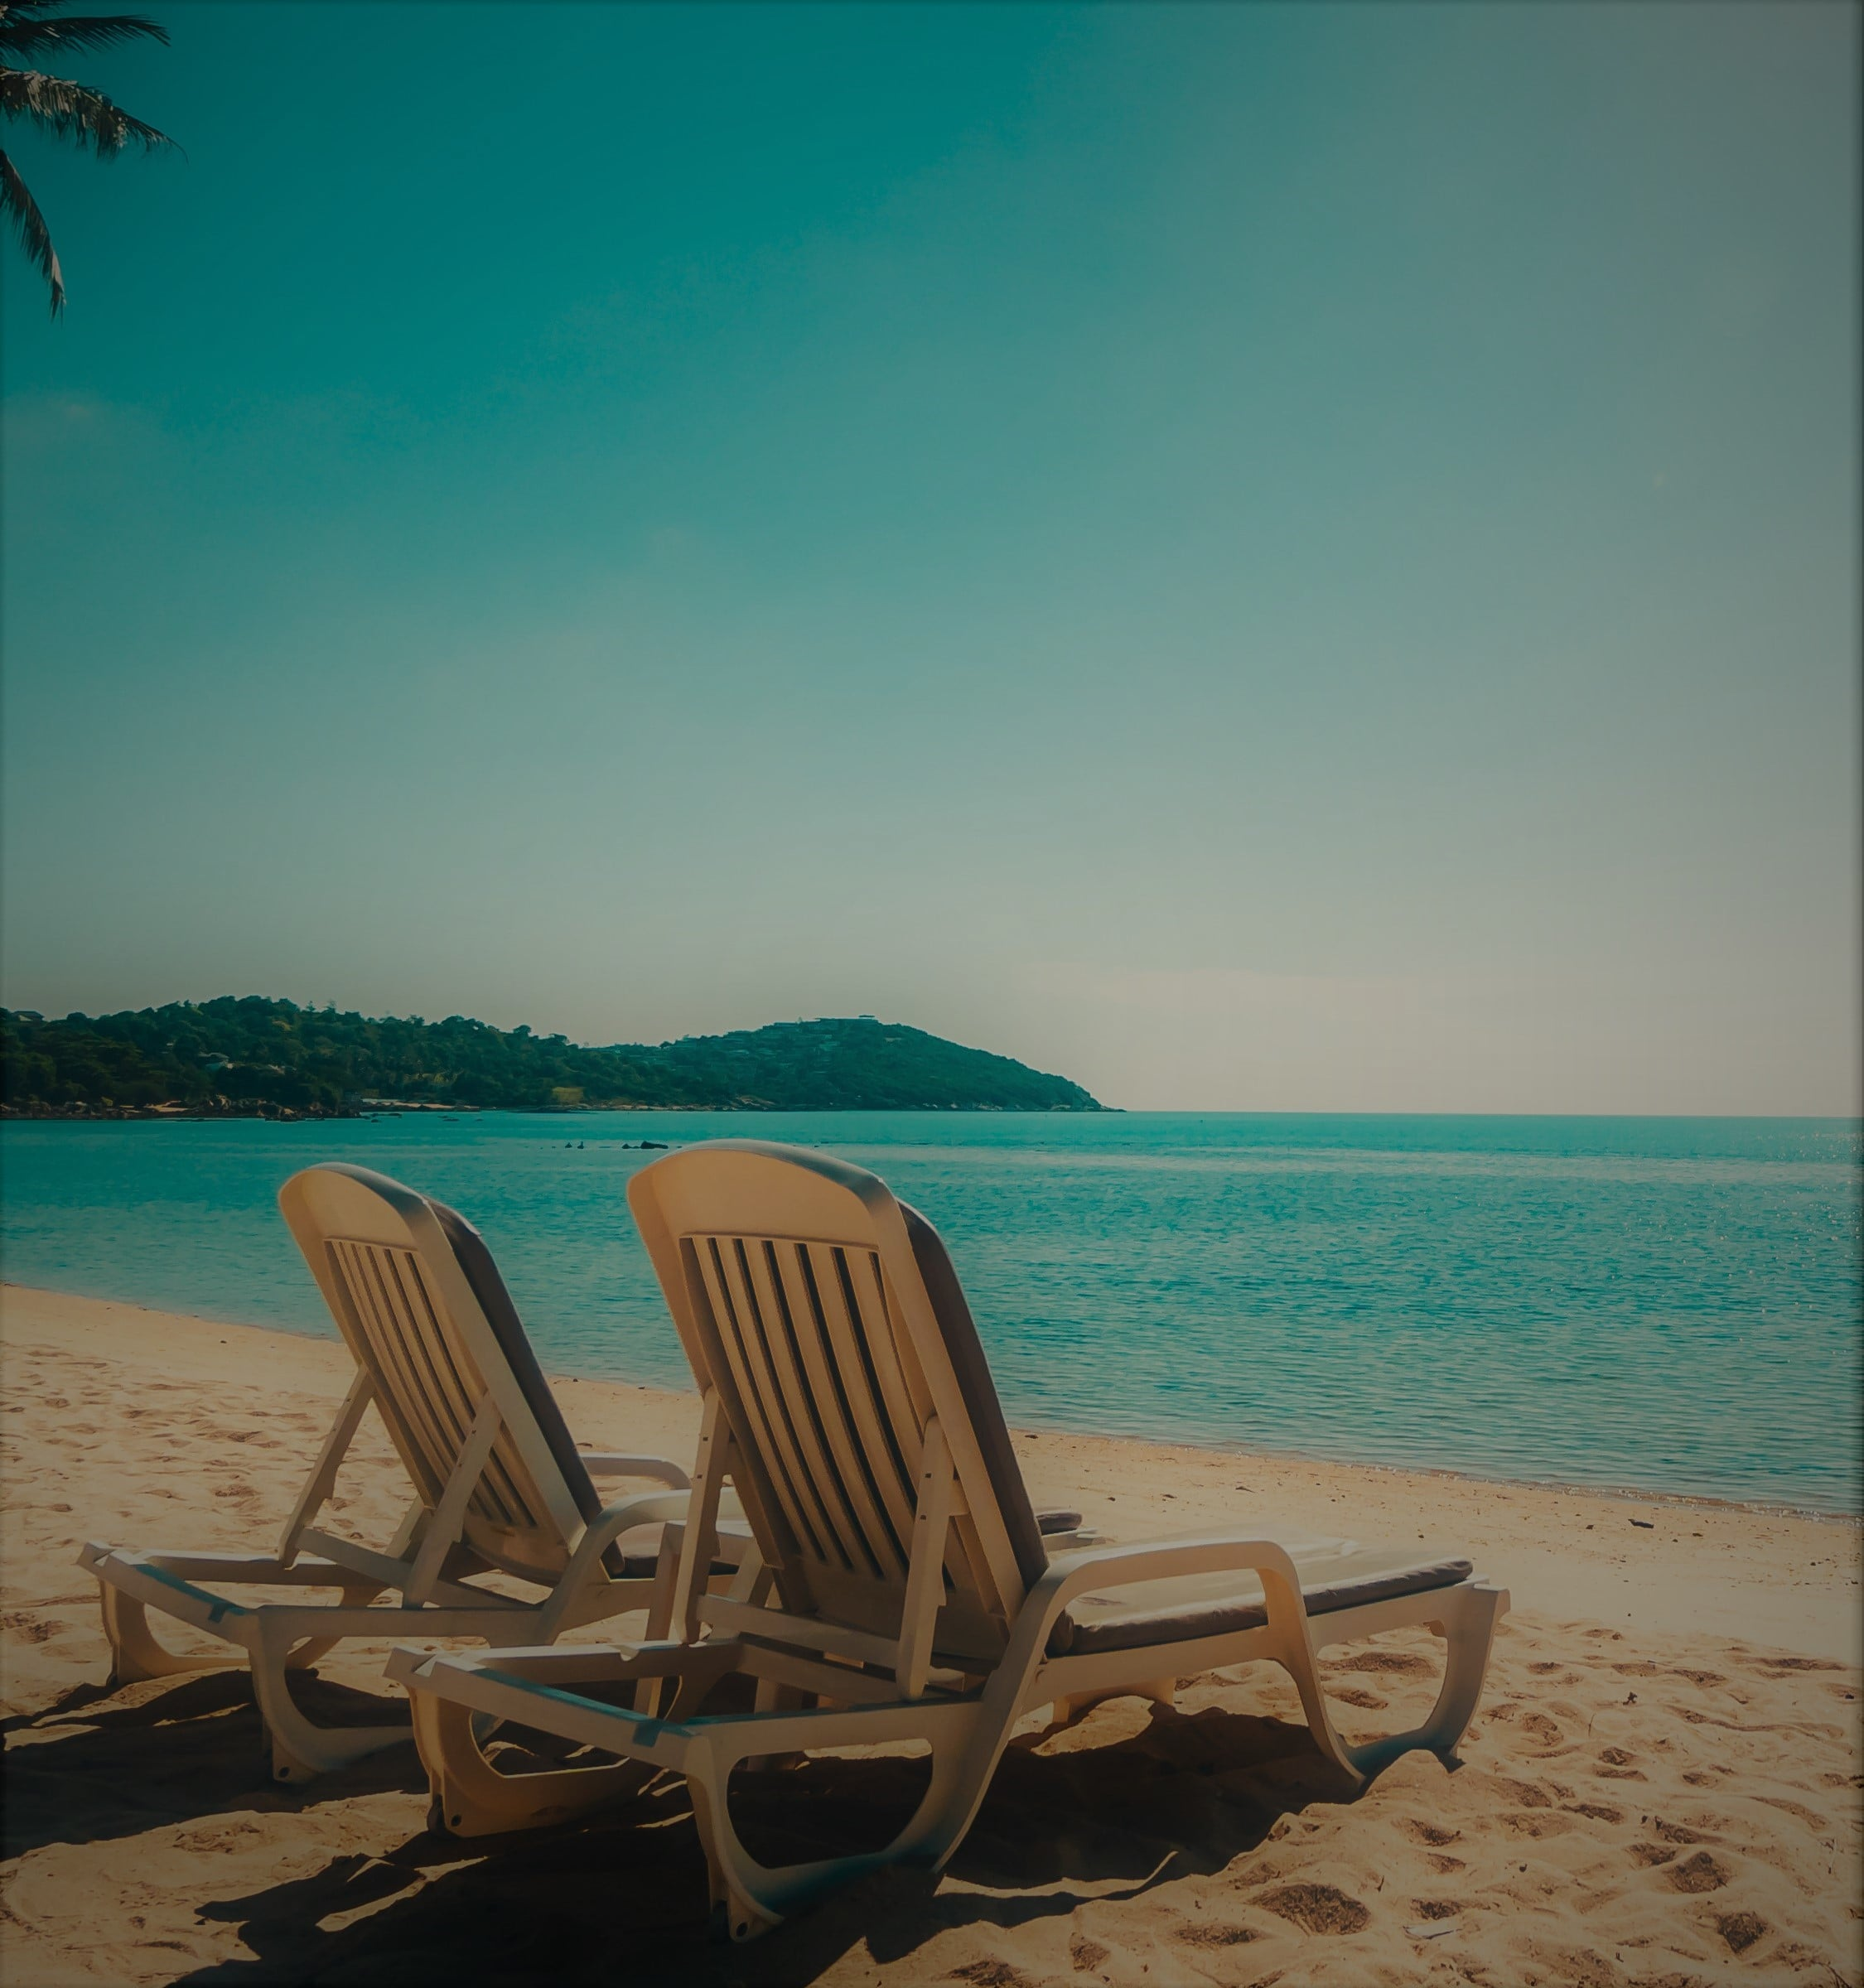 beautiful-tropical-beach-and-sea-with-chair-on-blue-sky-min.jpg